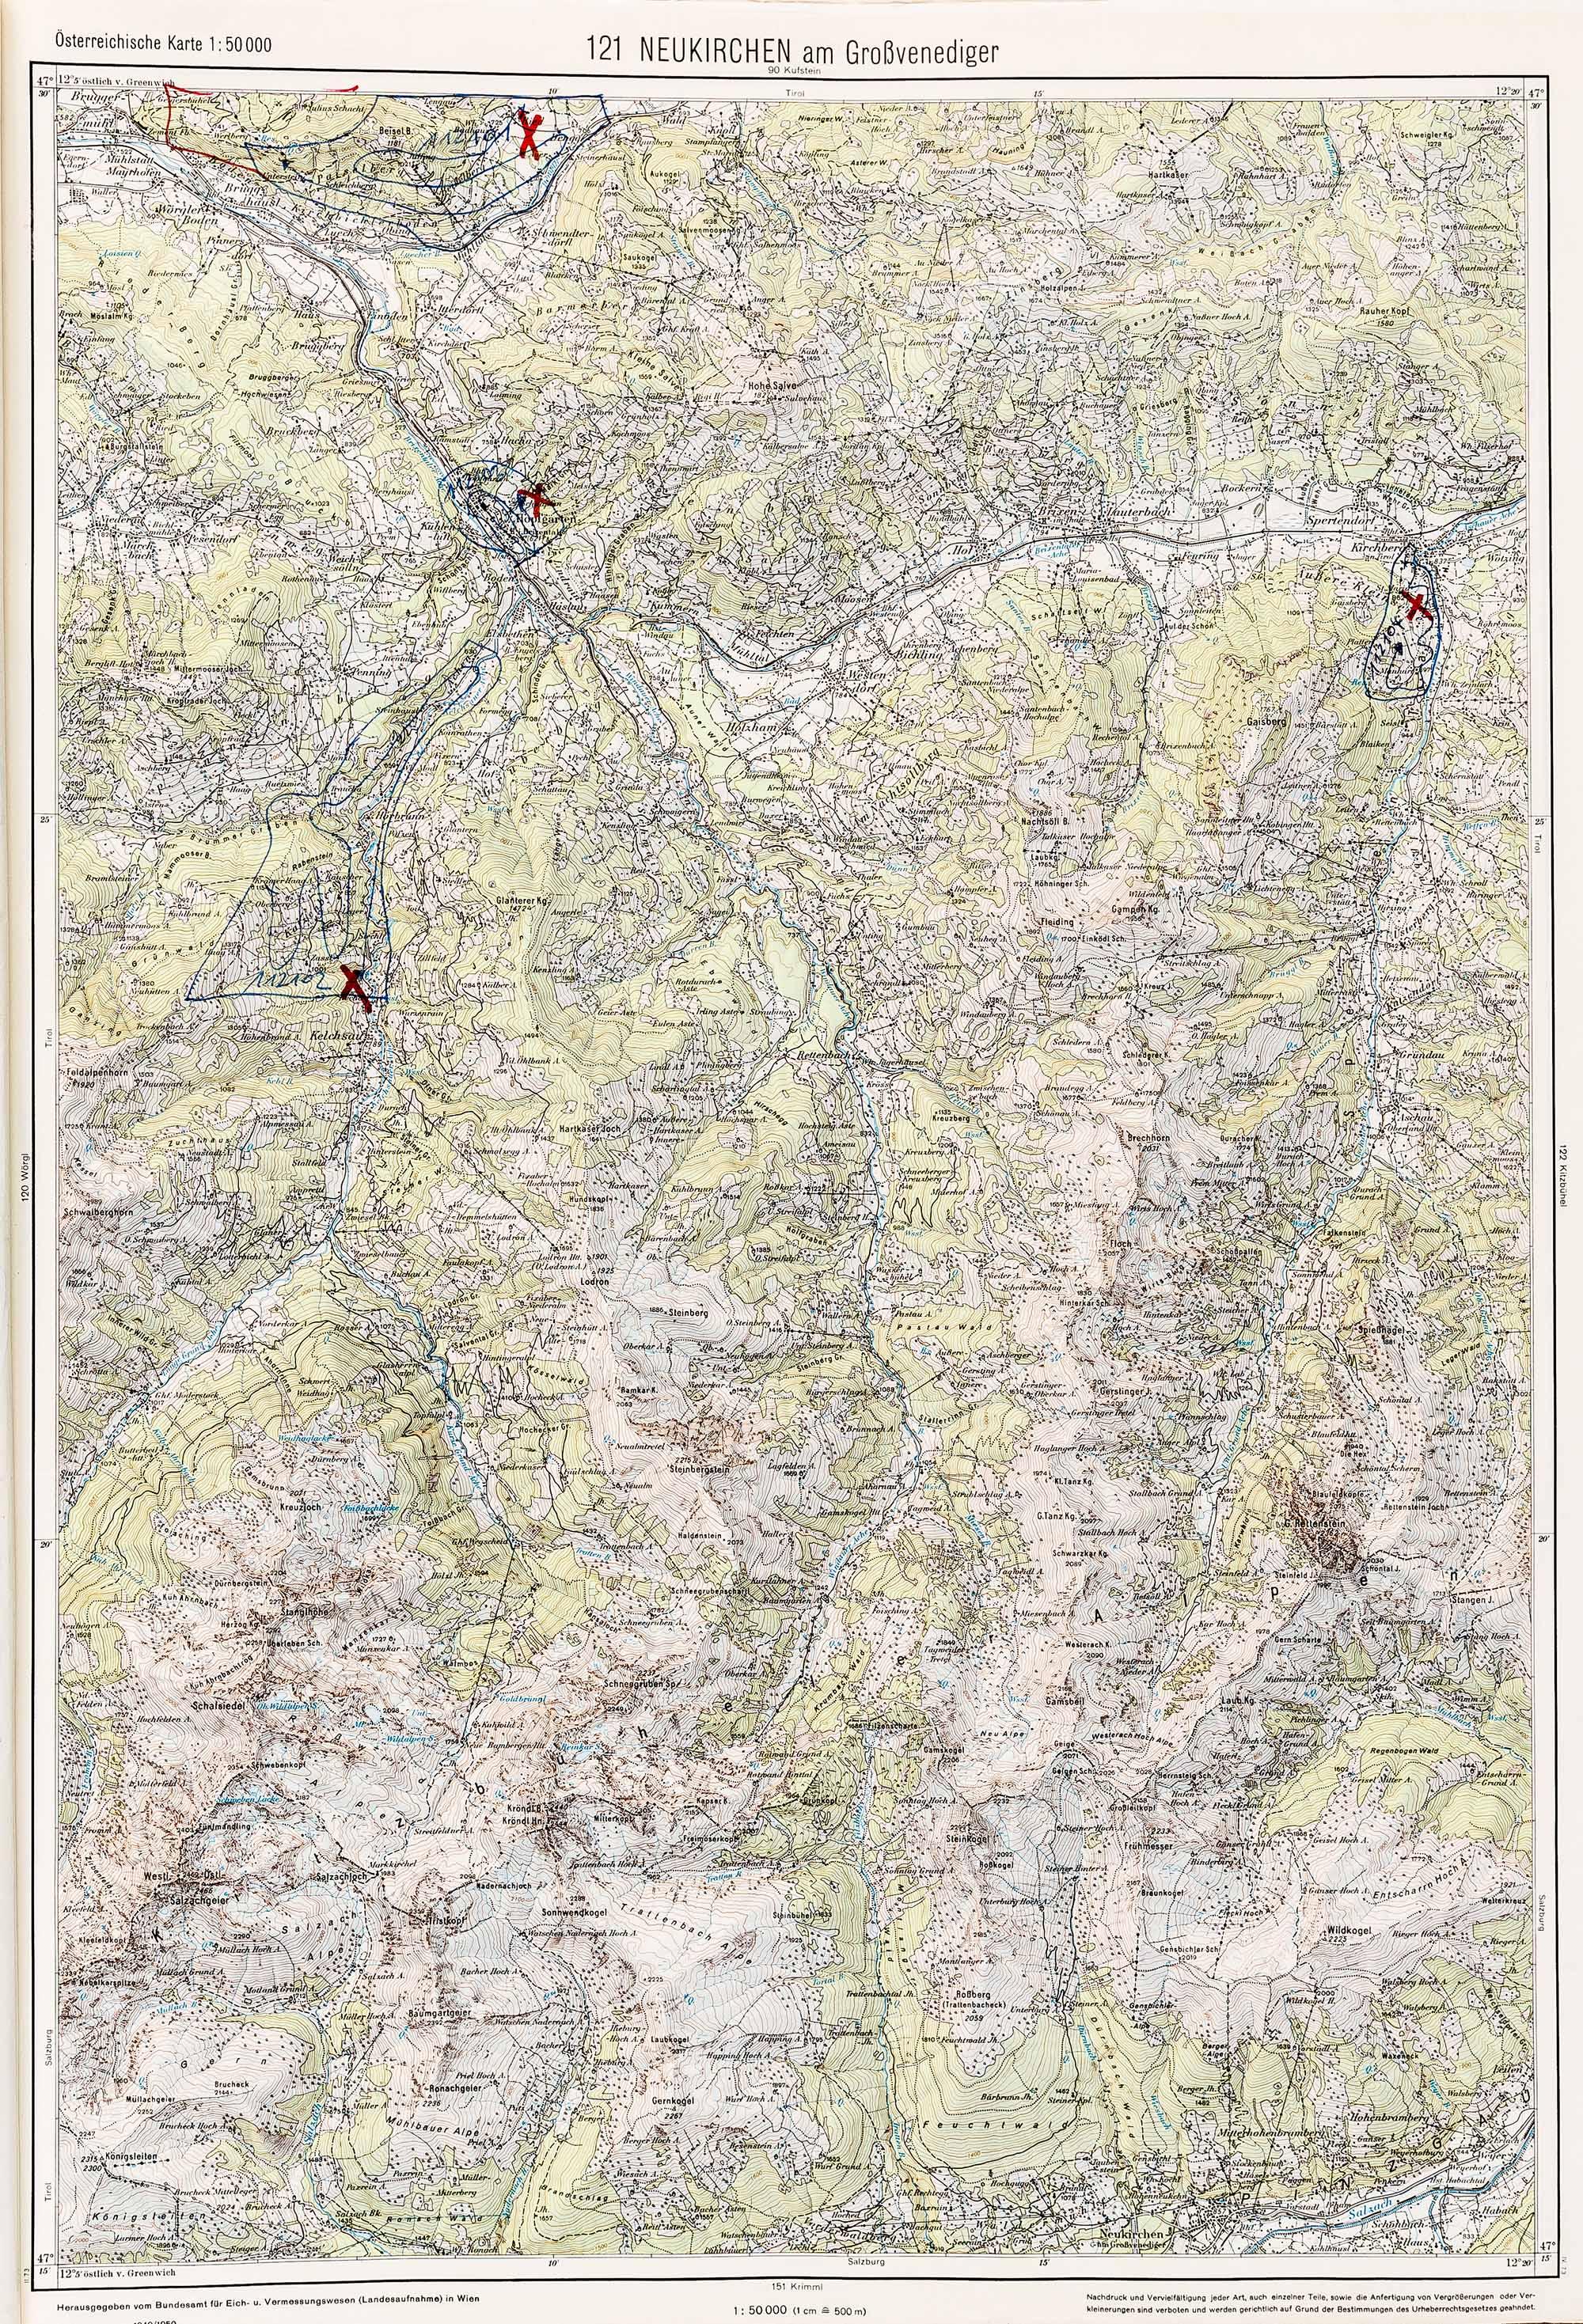 1979-1982 Karte 121